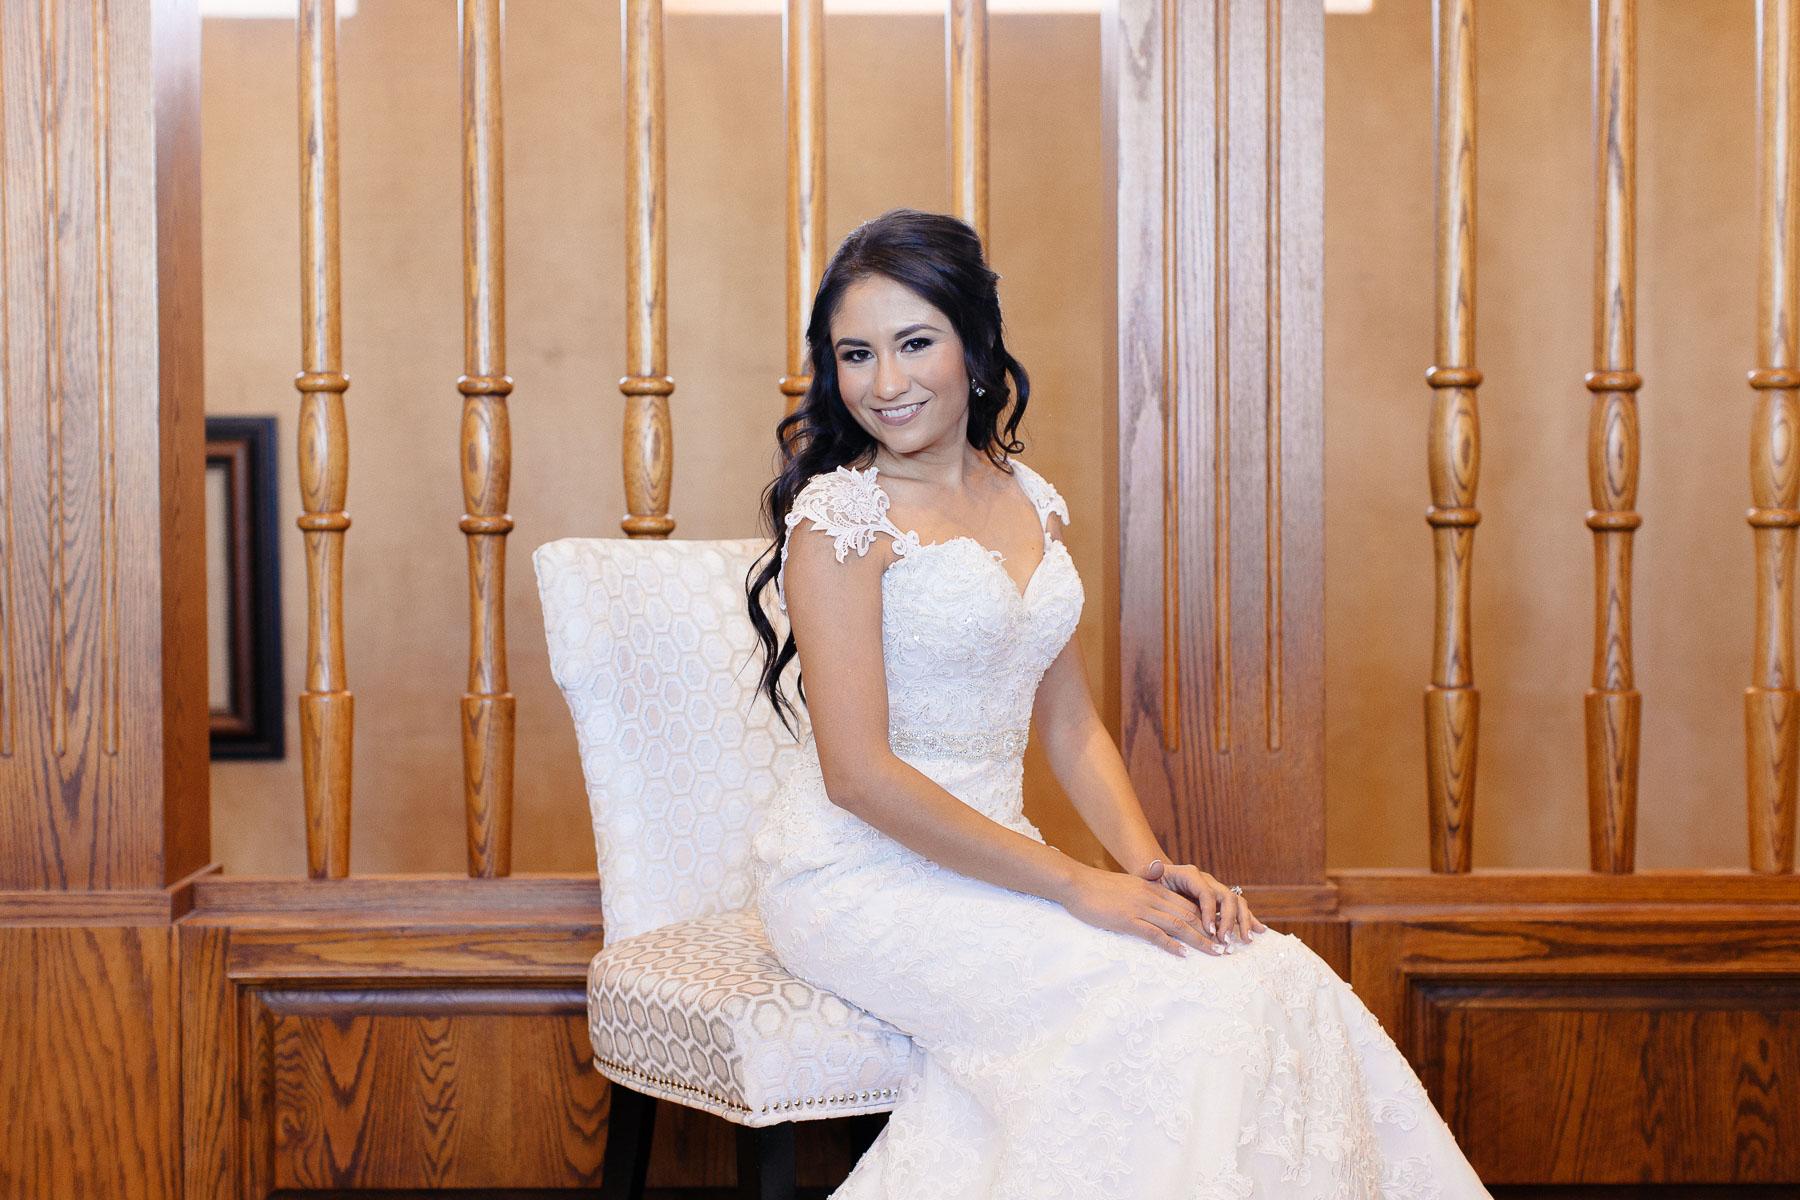 161029-Luxium-Weddings-Arizona-Jeff-Griselda-First-Look-Val-Vista-Lakes-Gilber-025.jpg